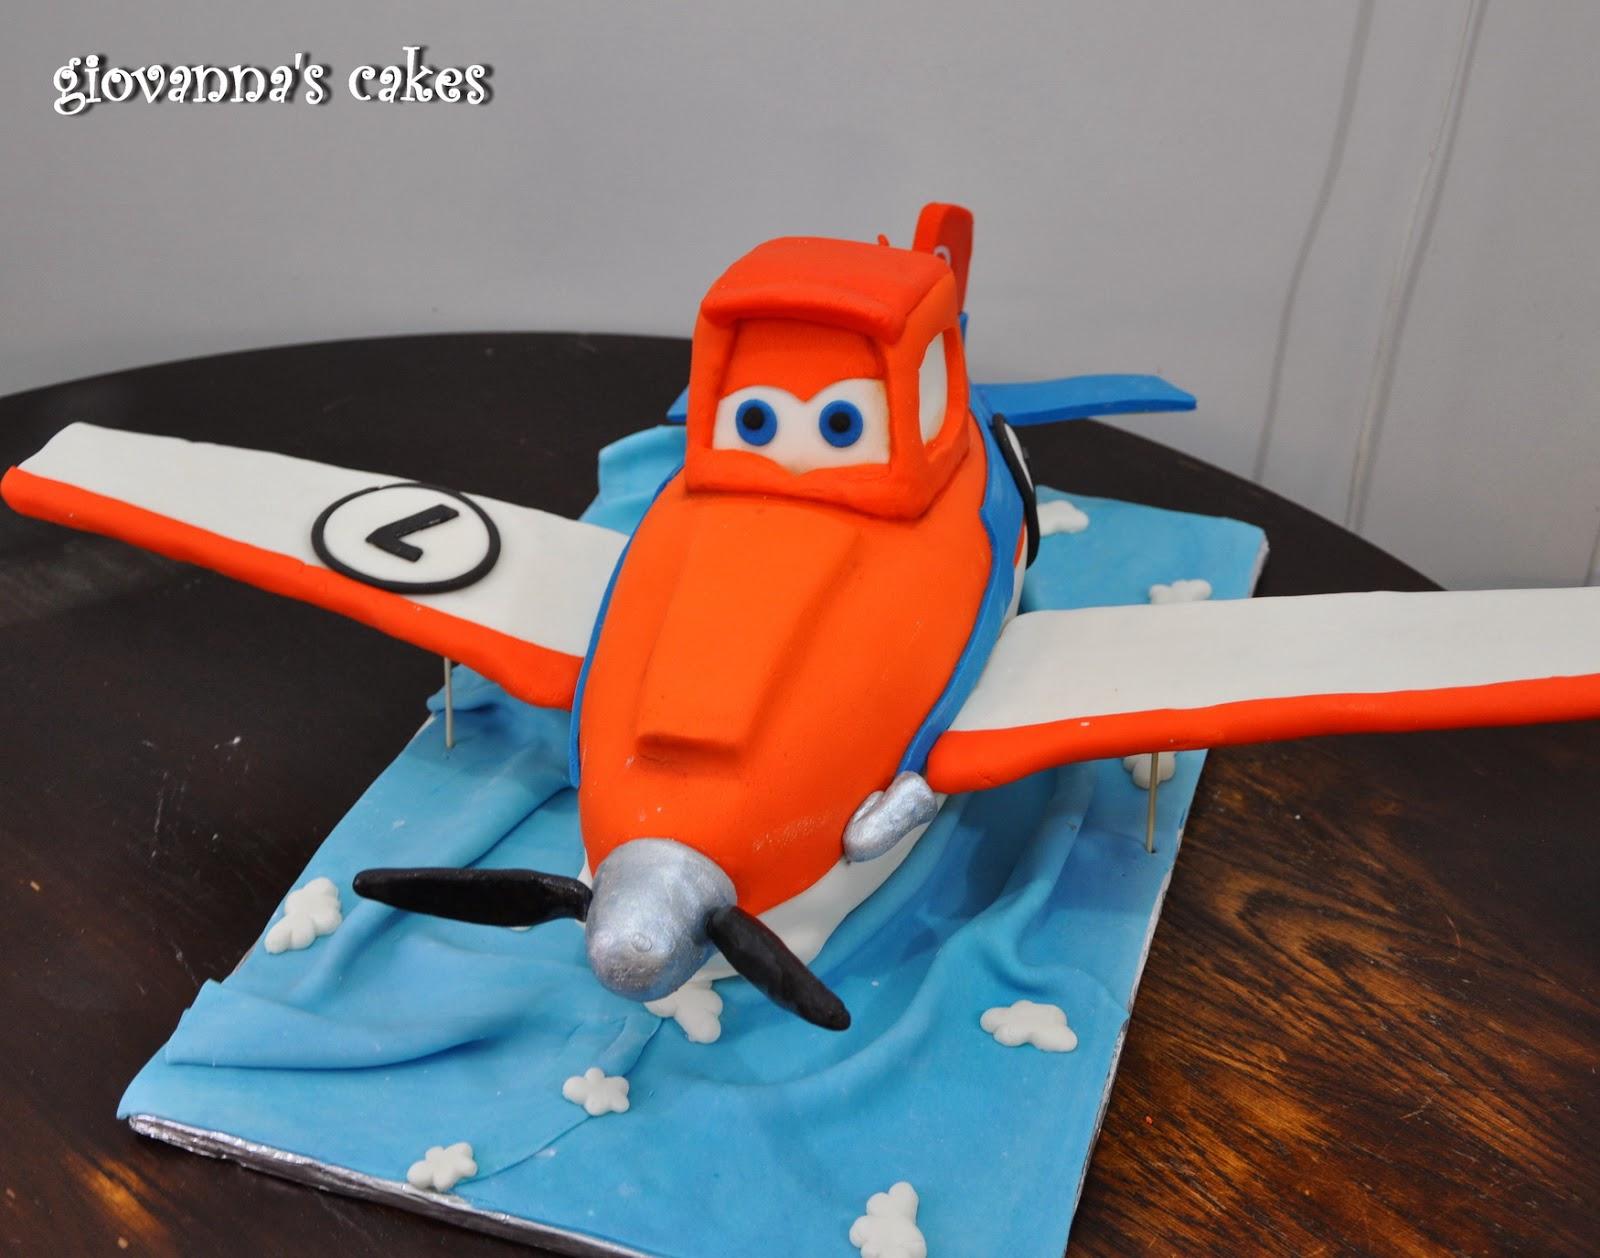 giovannas cakes Dusty the airplane cake